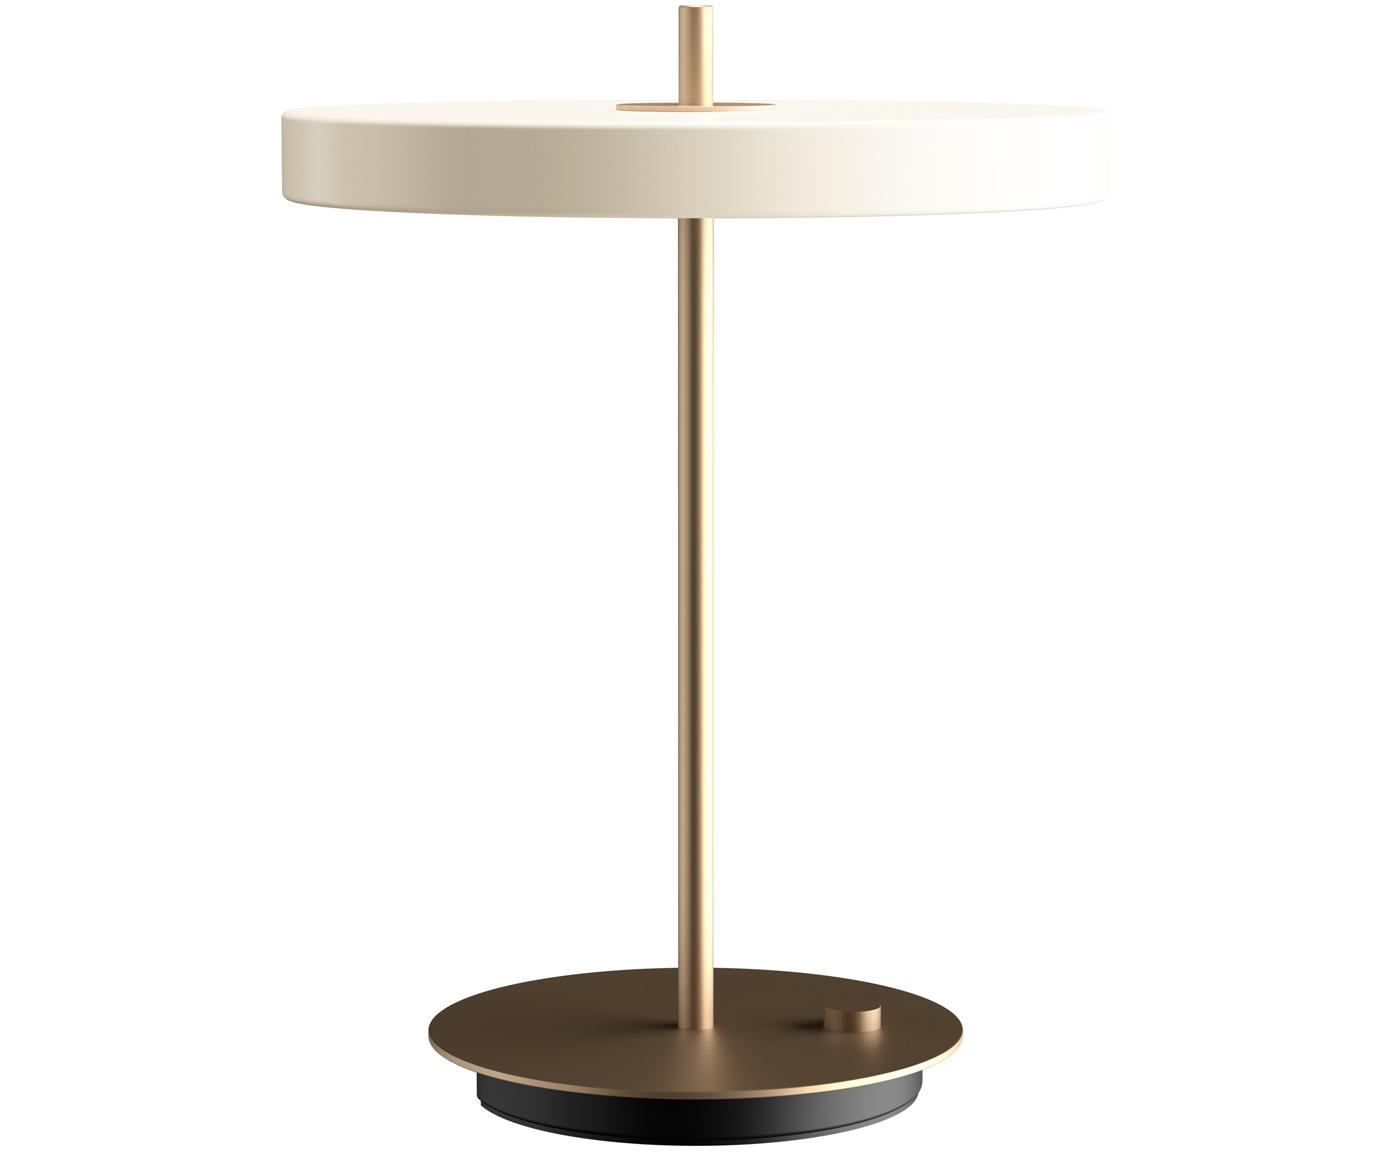 Dimbare LED tafellamp Asteria, Lampenkap: gelakt aluminium, Lampvoet: gelakt staal, Crèmewit, goudkleurig, Ø 31 x H 42 cm